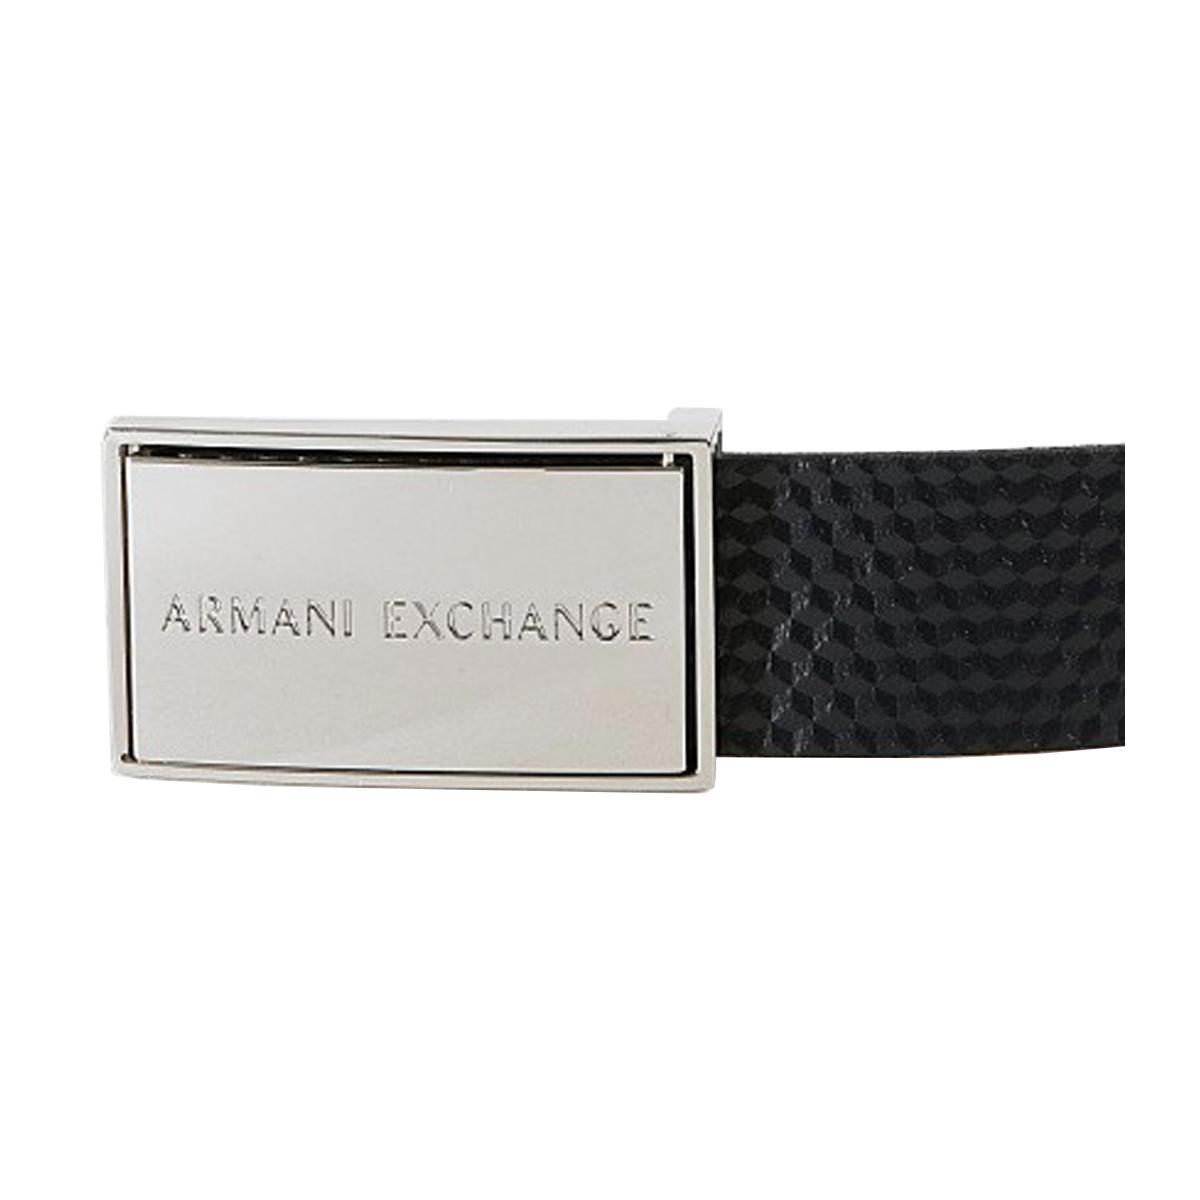 Cintura Armani Exchange reversibile da uomo rif. 951105 9P176 06439